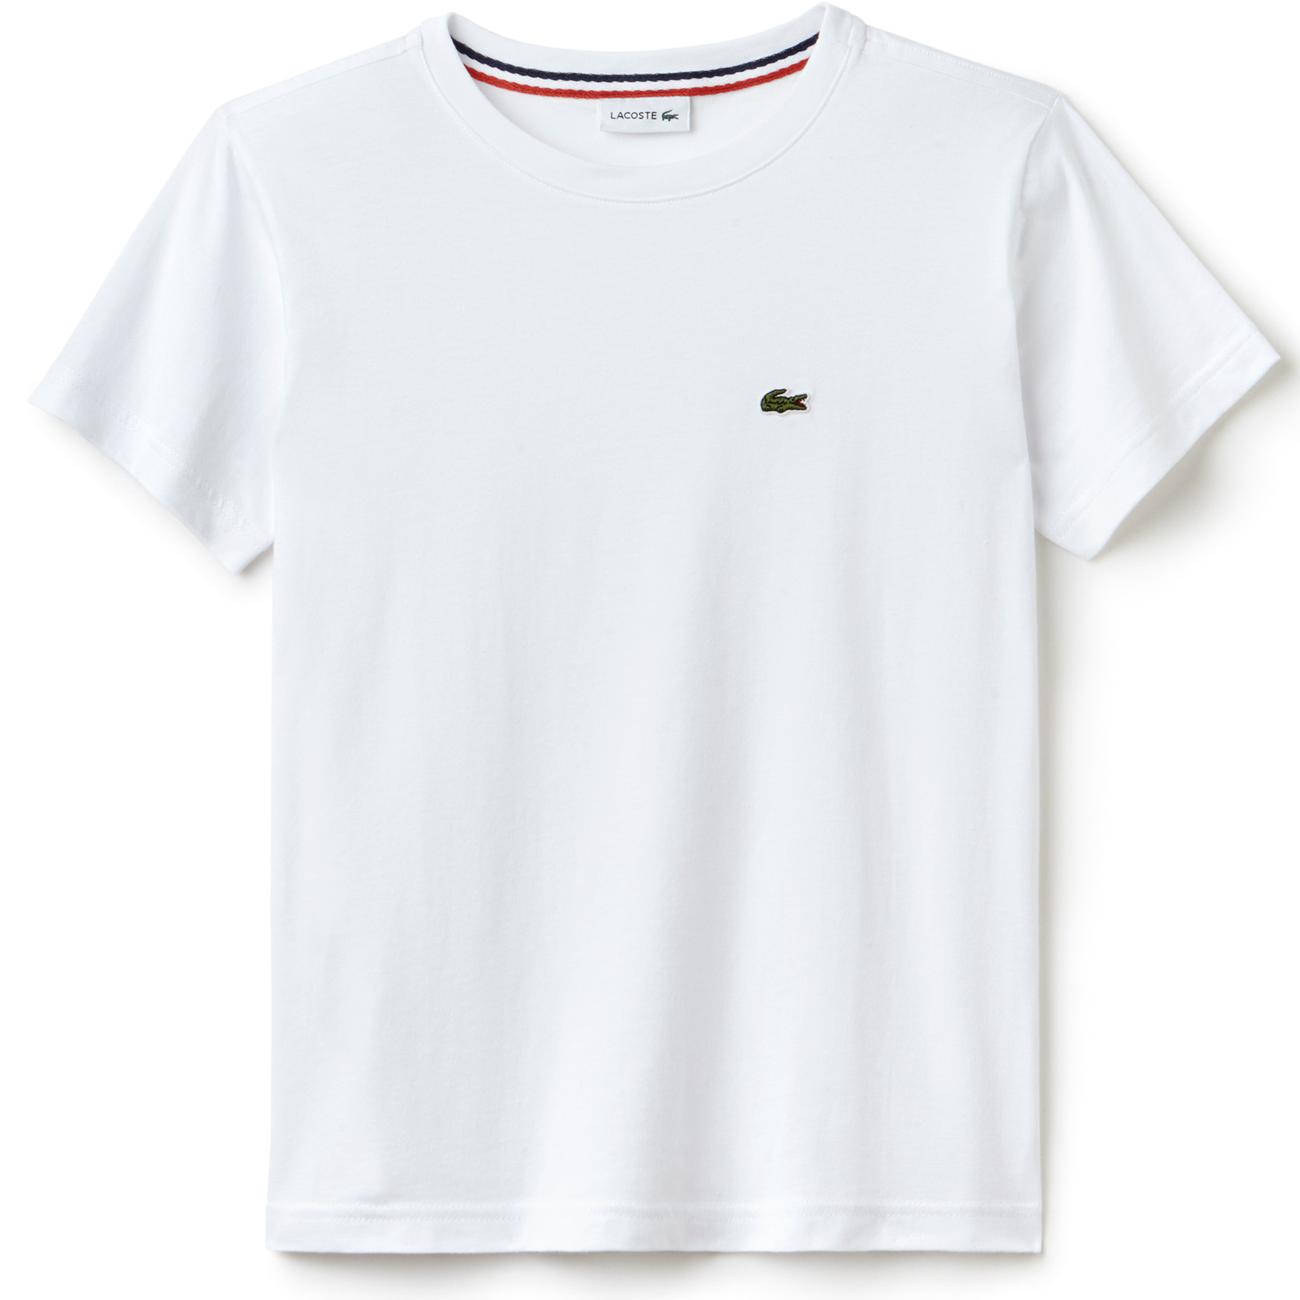 Lacoste T-Shirt Blanc